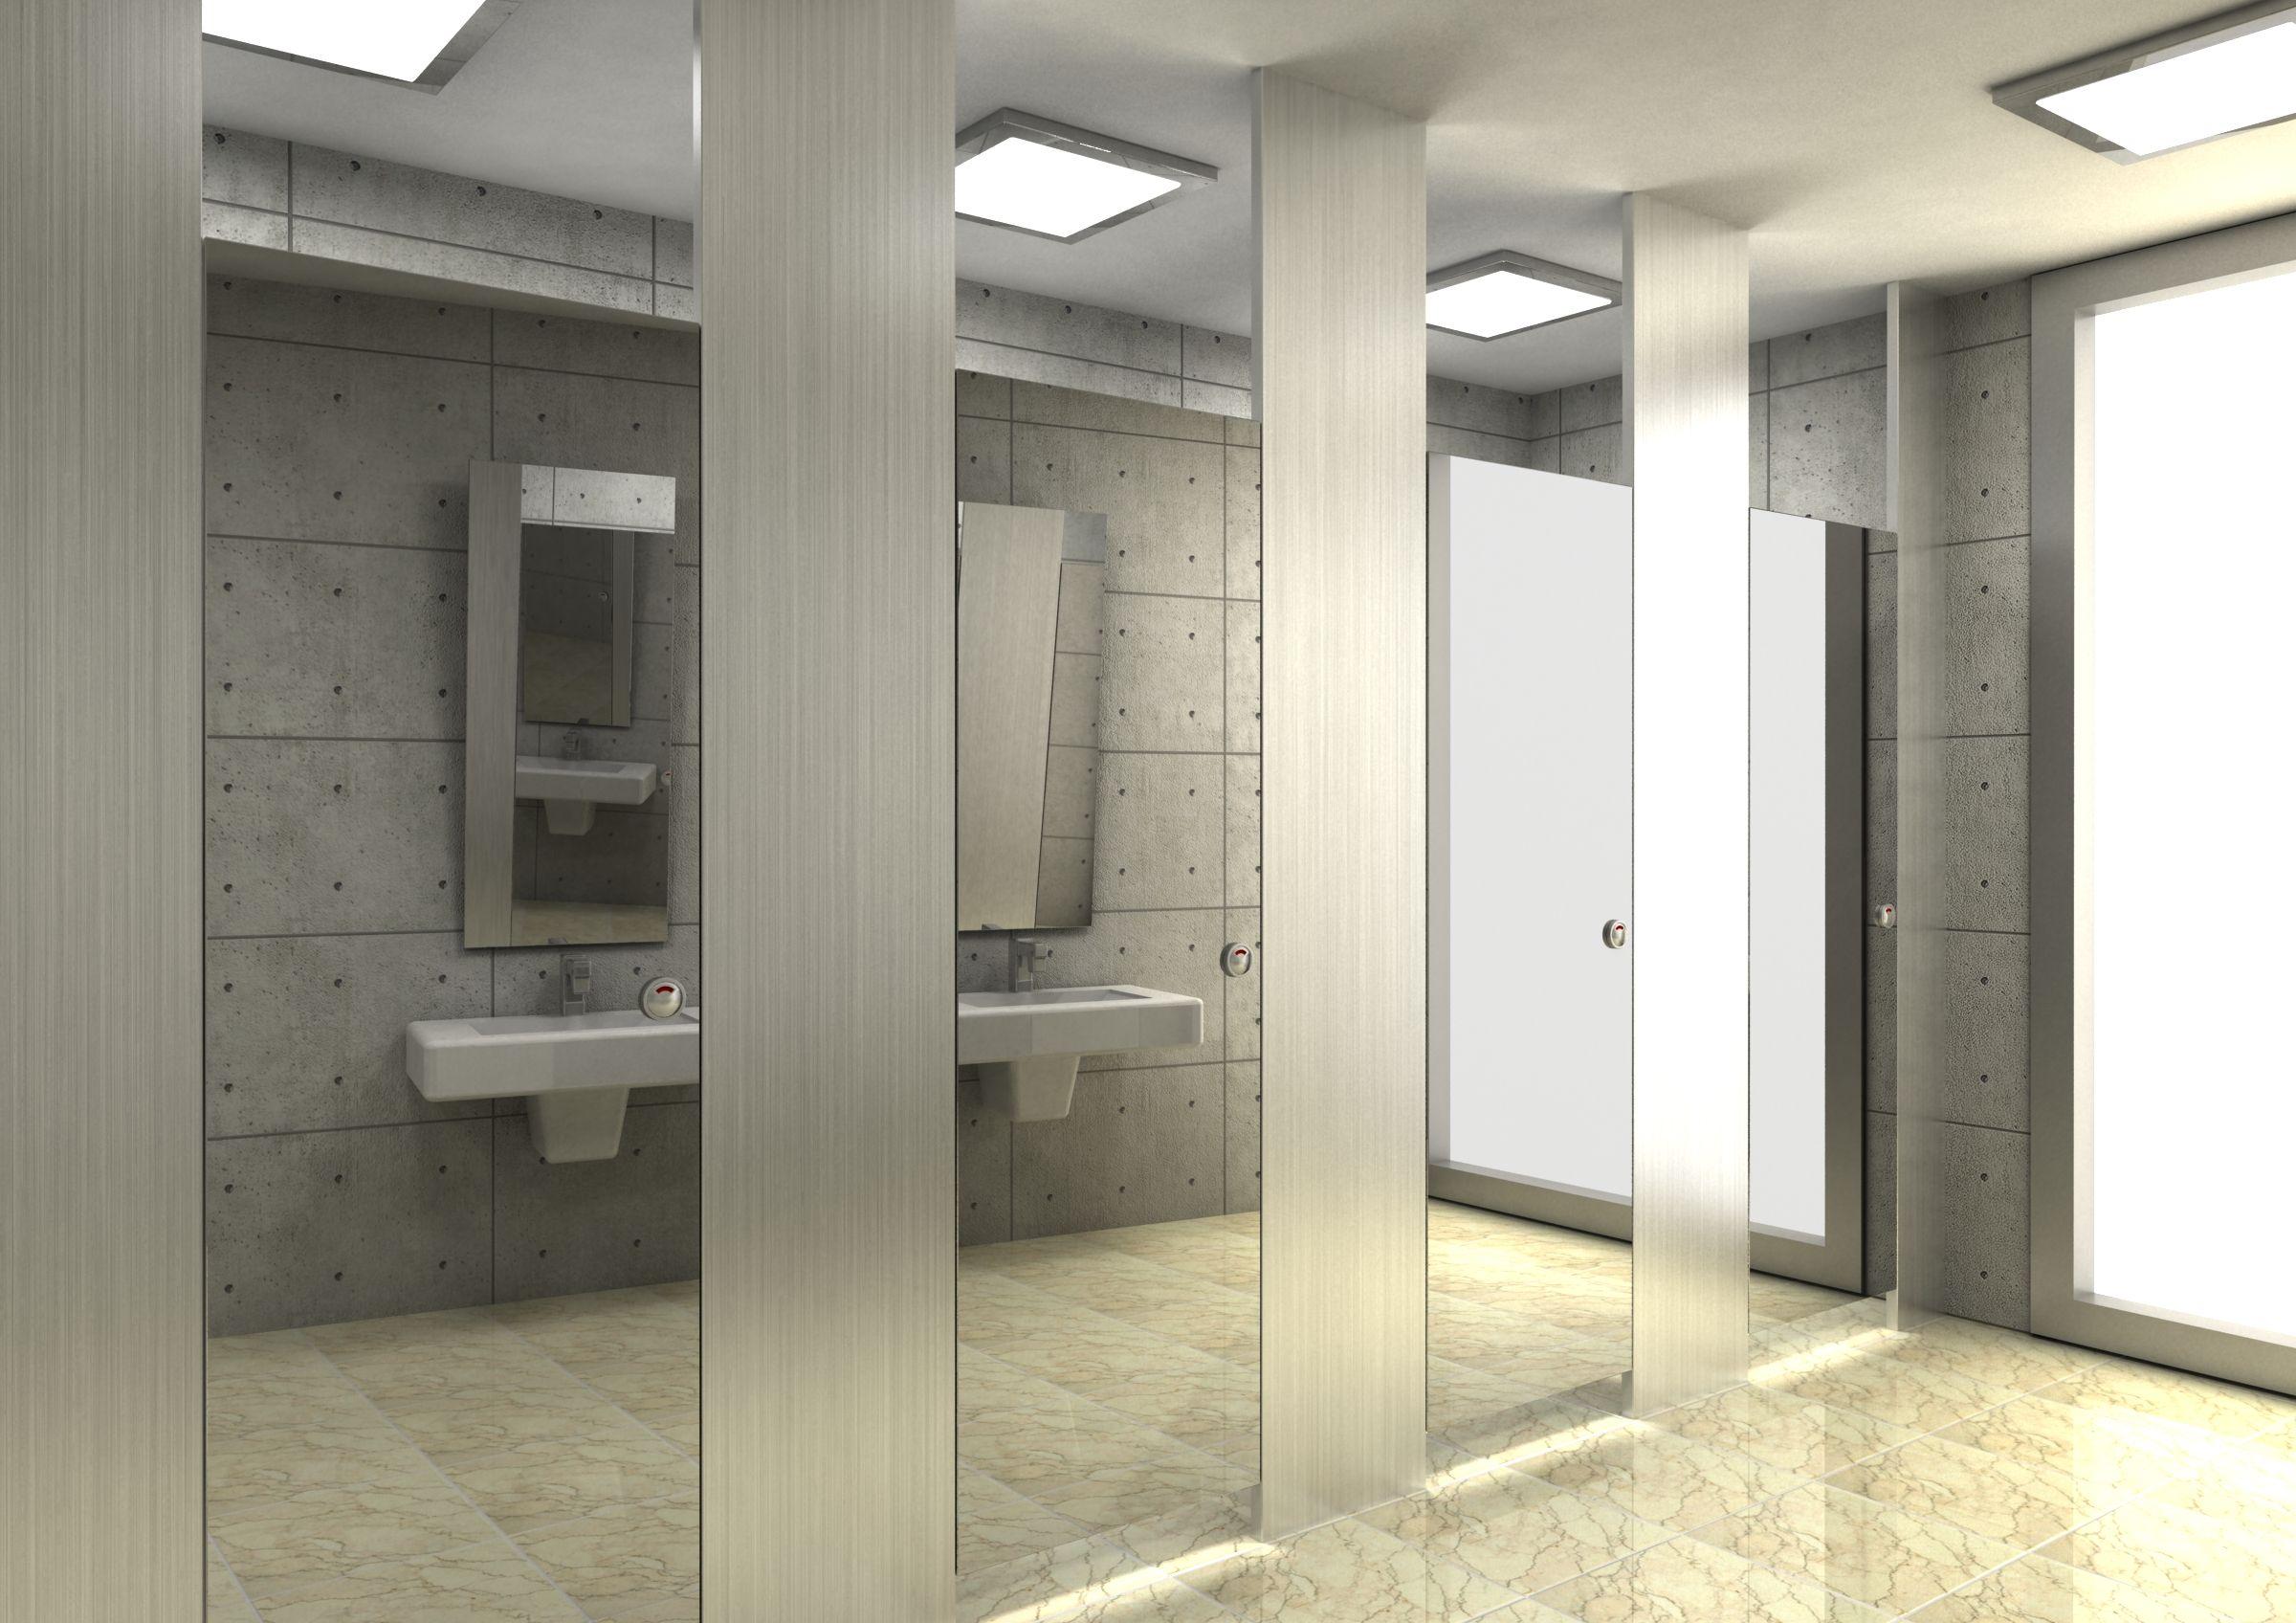 Public bathroom layout dimensions - Public Restroom Design Google Search